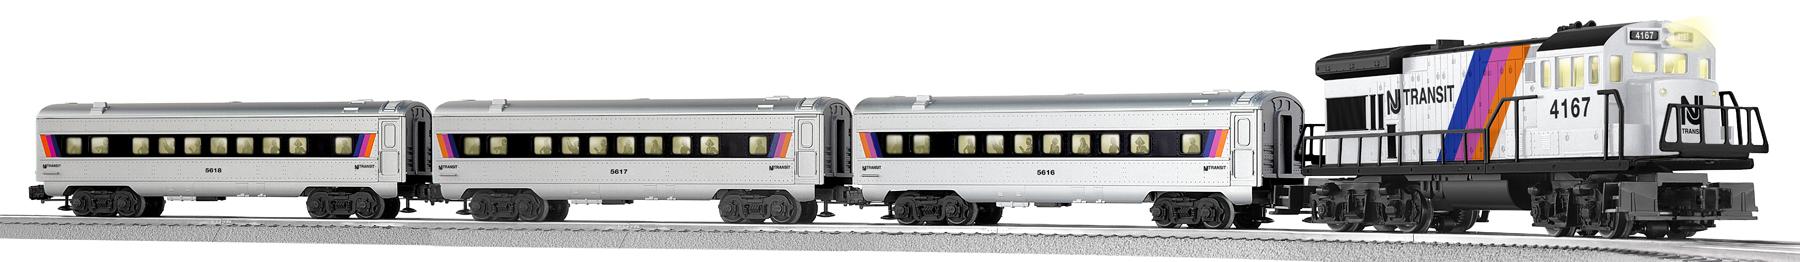 Limited Edition Historic Series Ready To Run Nj Transit Train Set